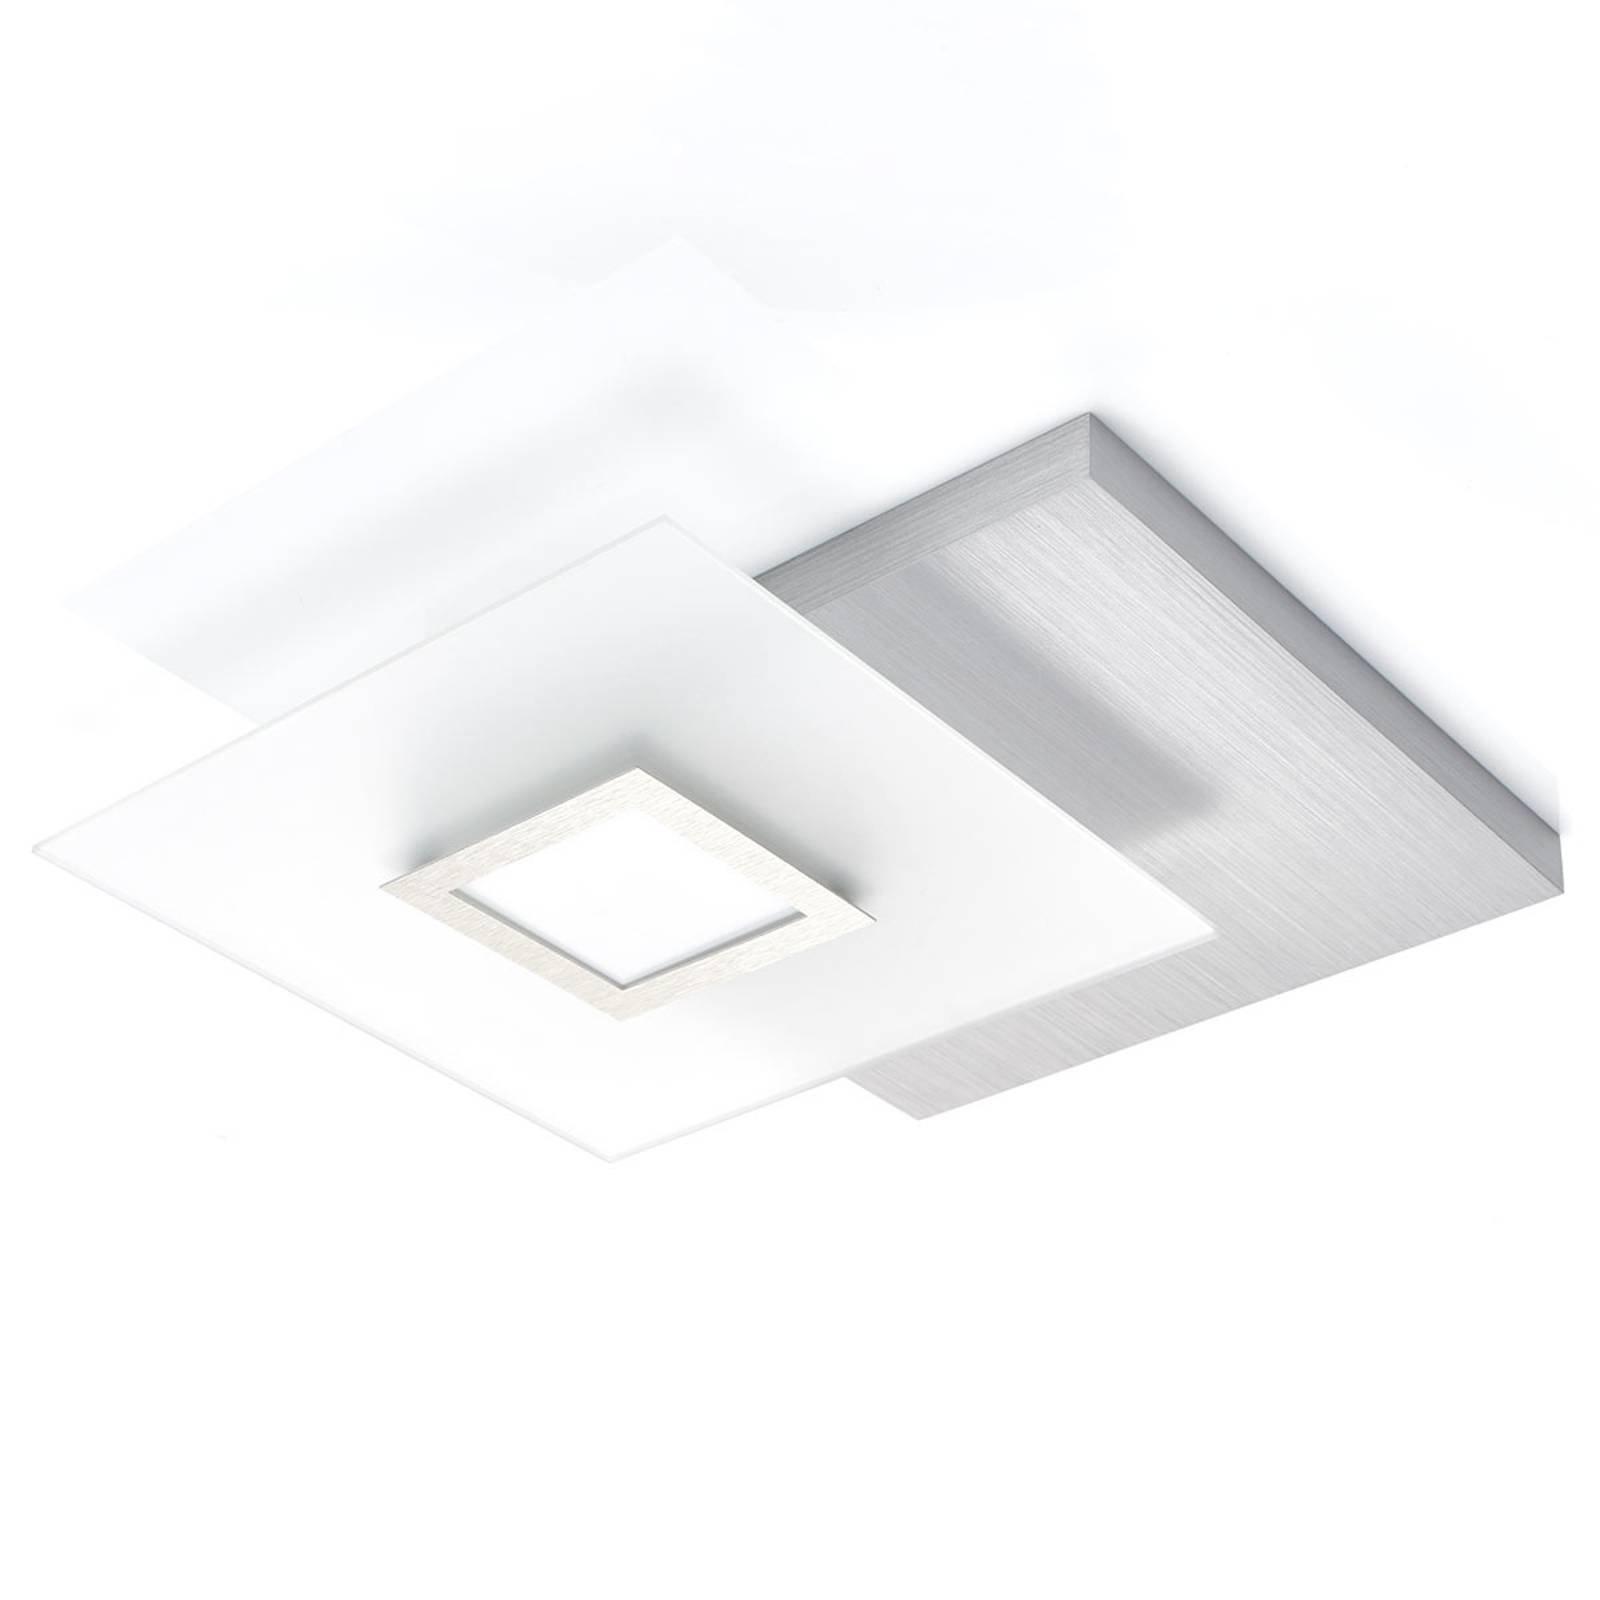 Spesiell LED-taklampe Flat, dimbar